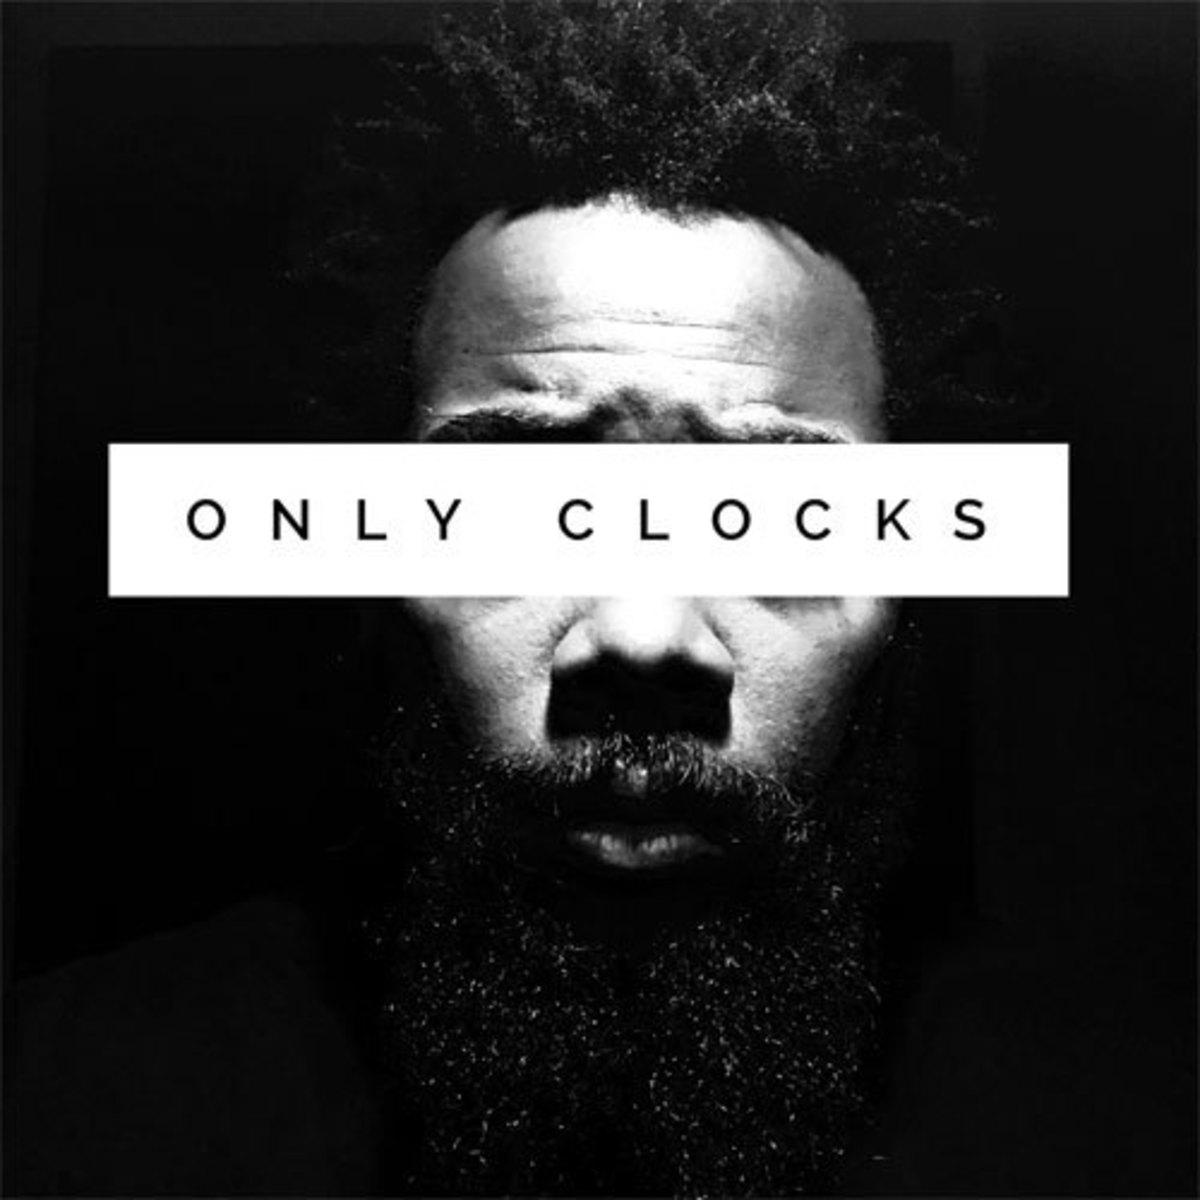 stanza-only-clocks.jpg